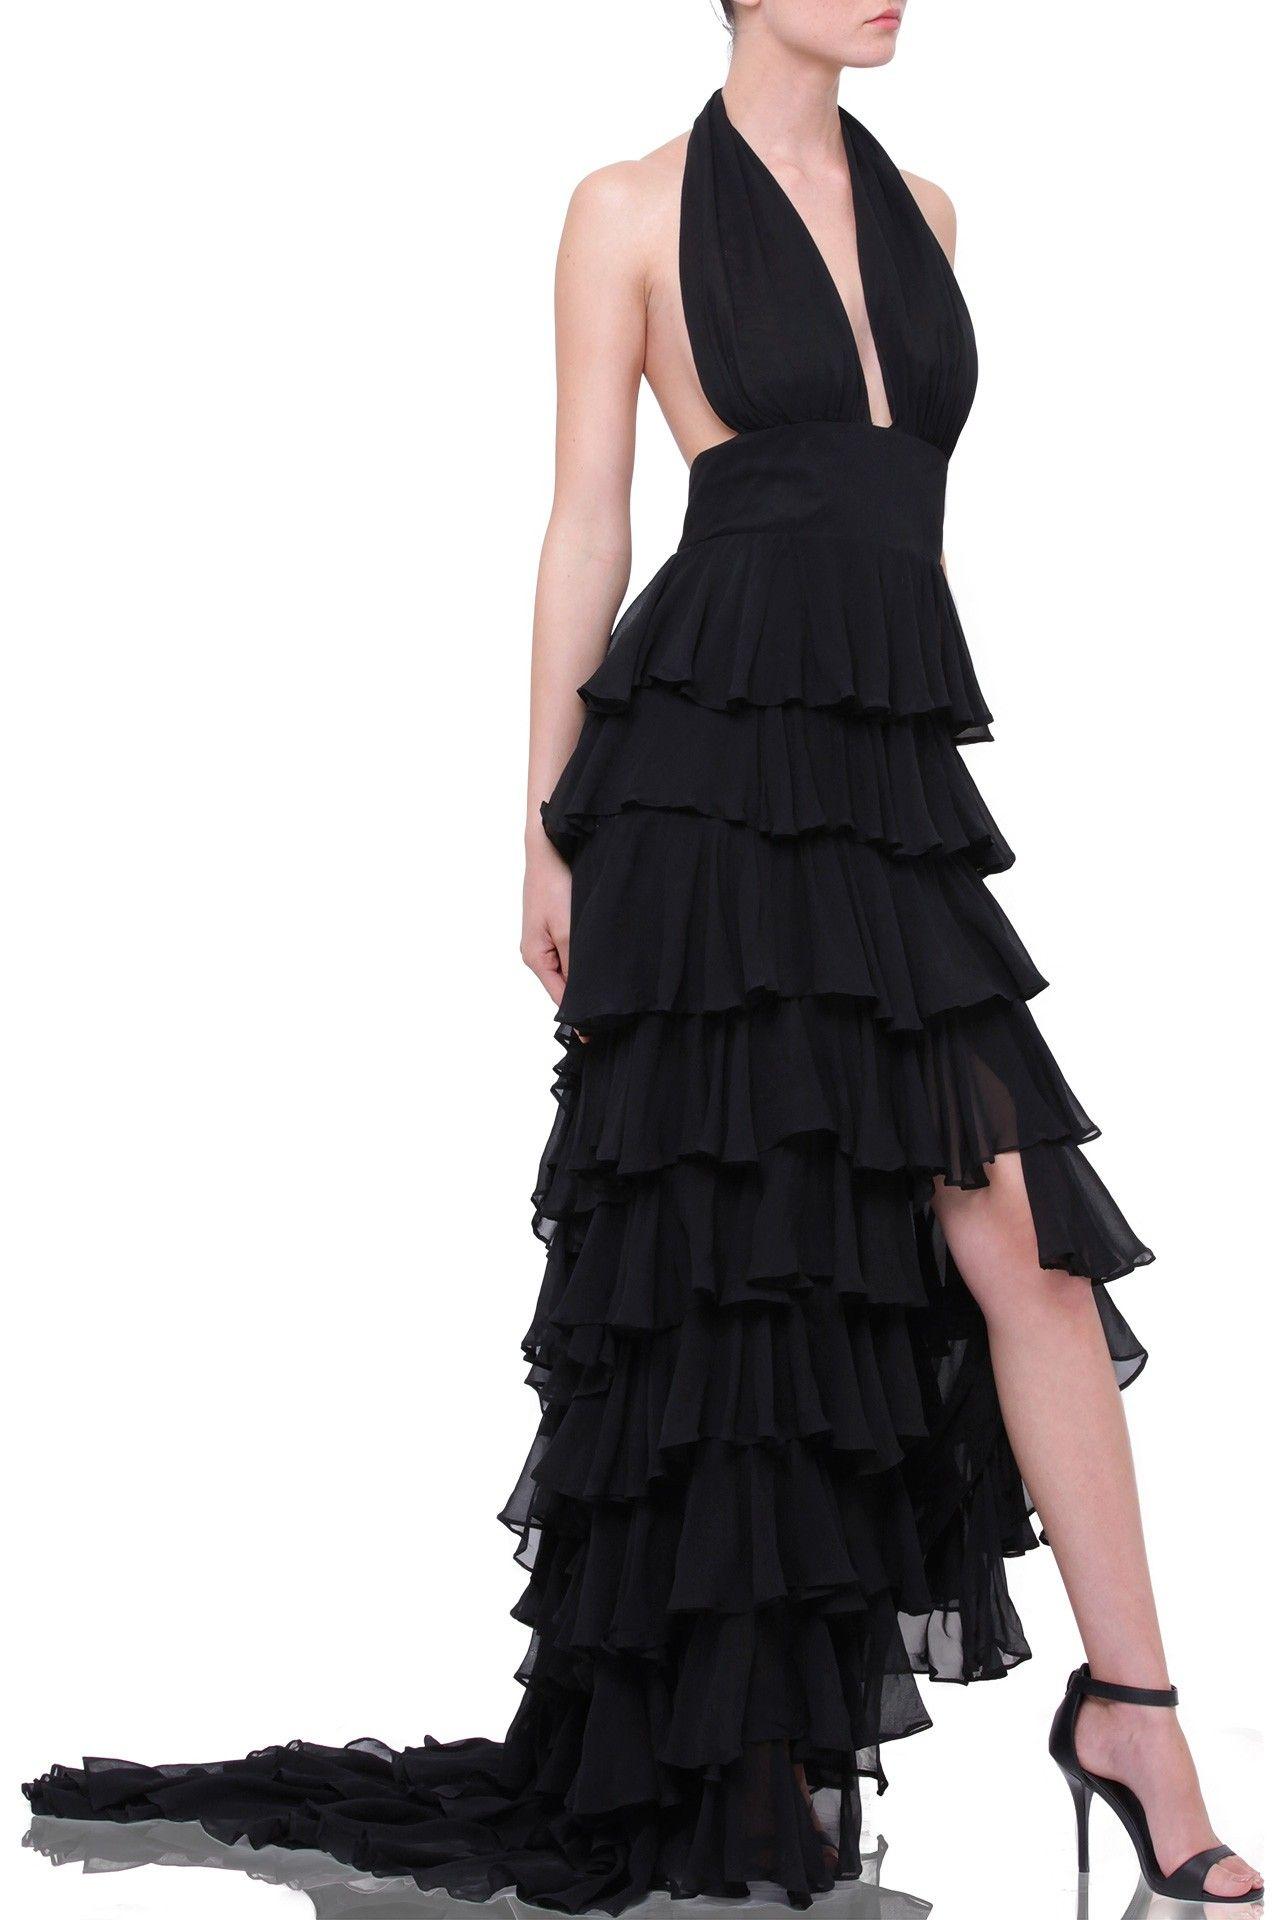 Park Art My WordPress Blog_Petite Black Dress For Wedding